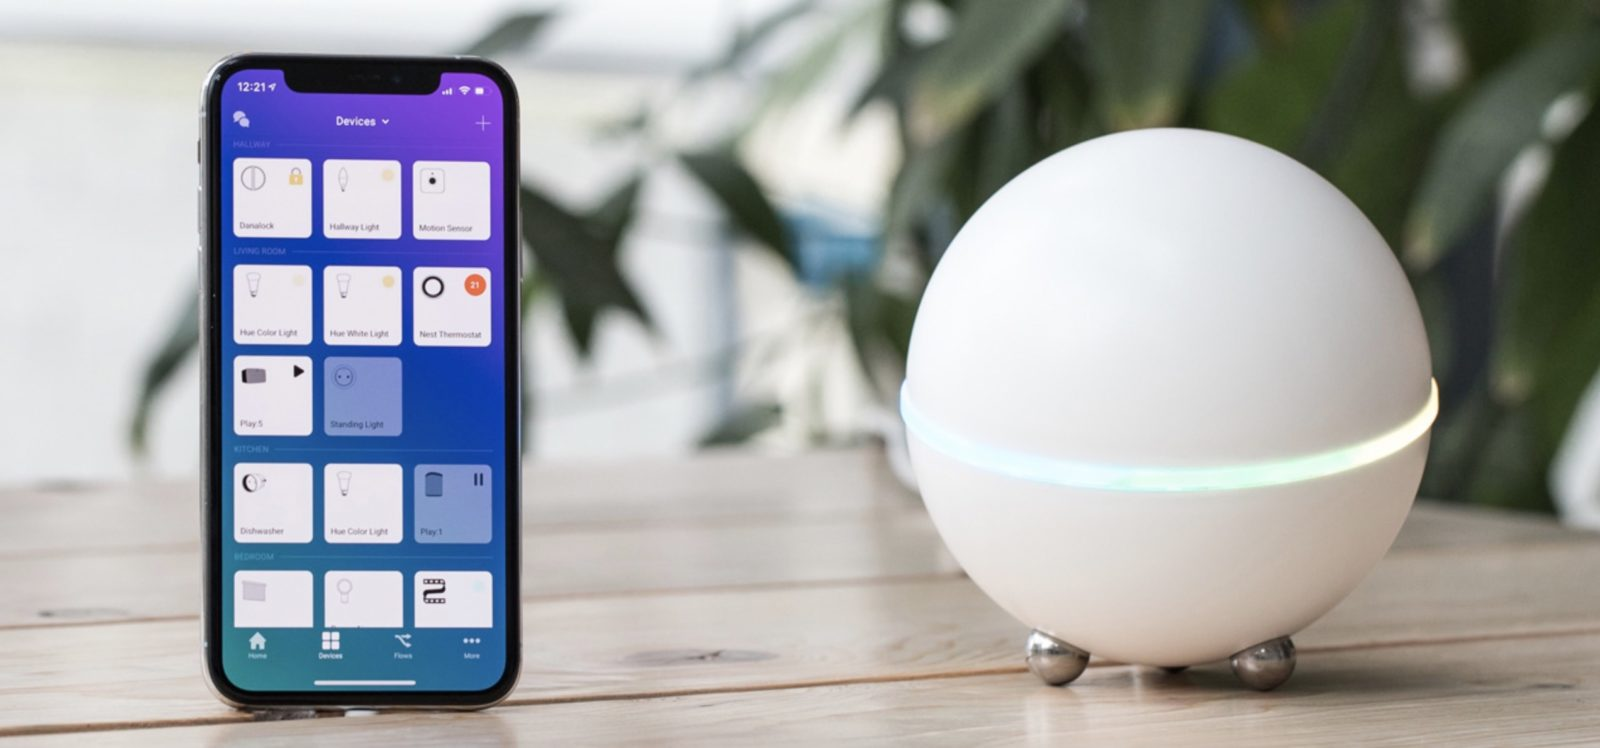 Homey, il sacro graal della domotica mette d'accordo Zigbee, Z-wave, RF, Xiaomi e… Homekit